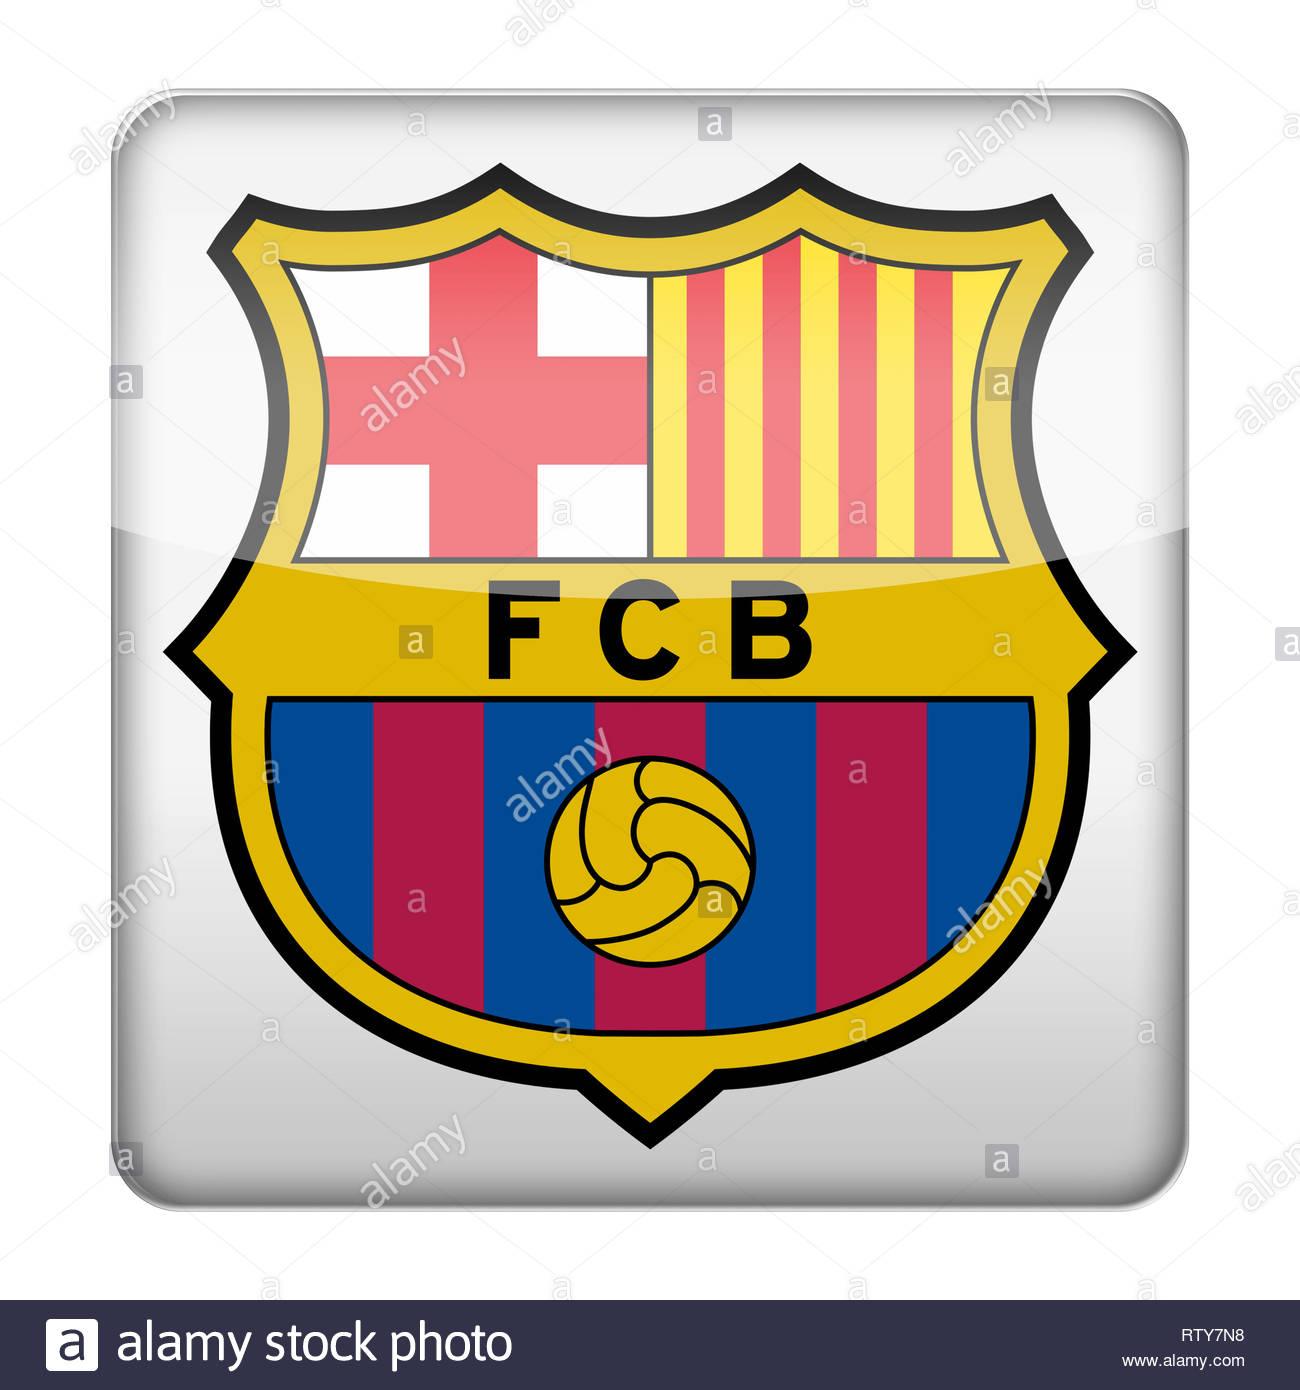 FC Barcelona logo - Stock Image